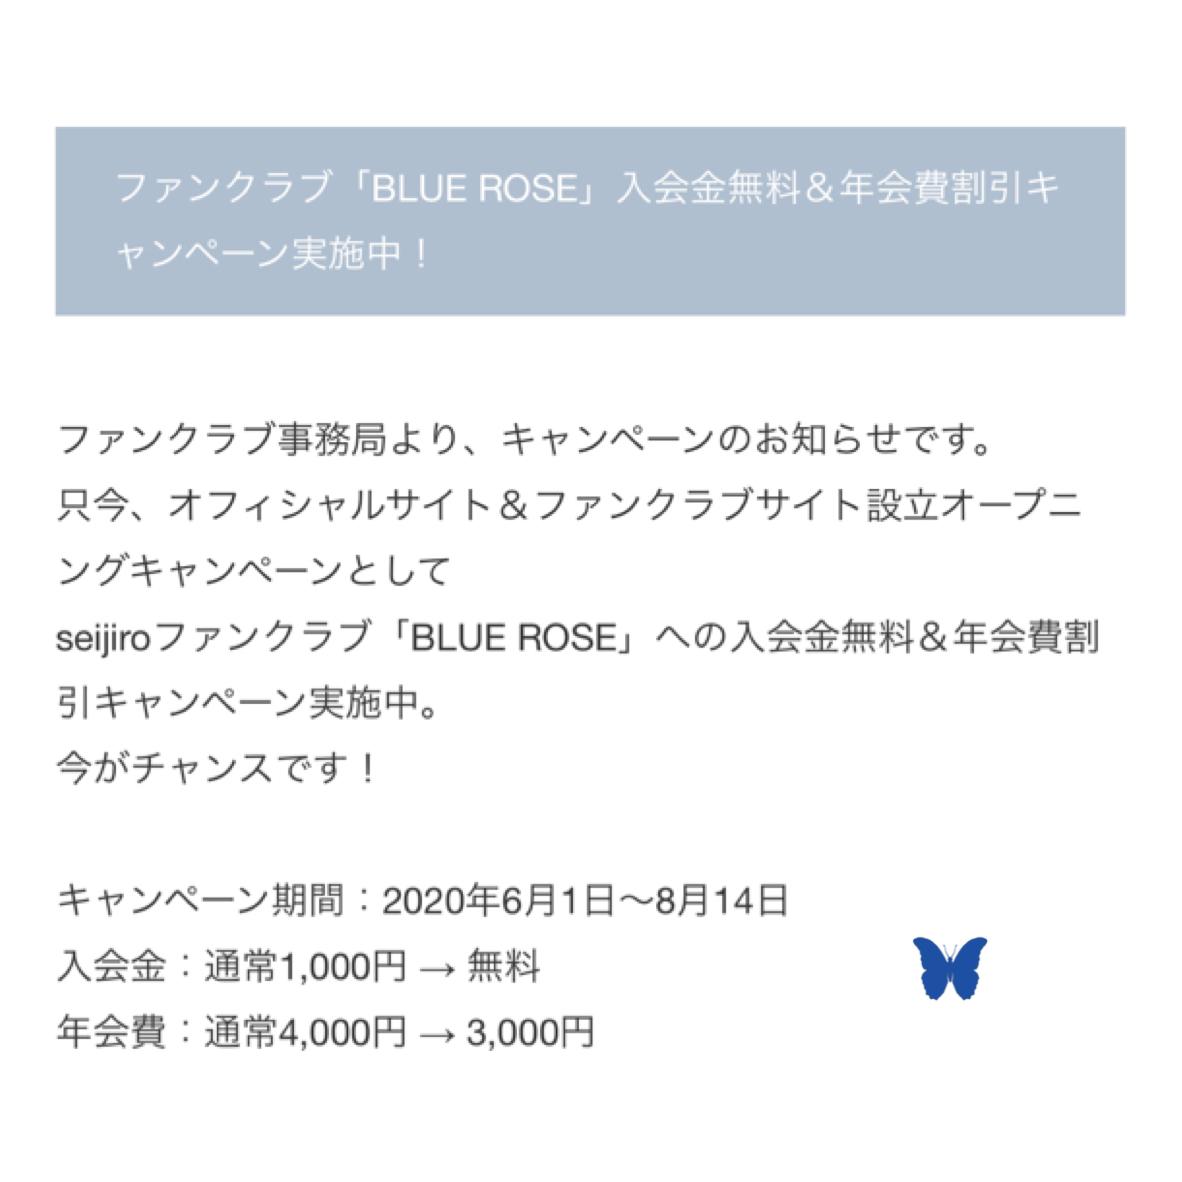 Seijiroオフィシャルファンクラブ「BLUE ROSE」設立記念 オープニングキャンペーン実施中です♡_a0157409_21550880.jpeg